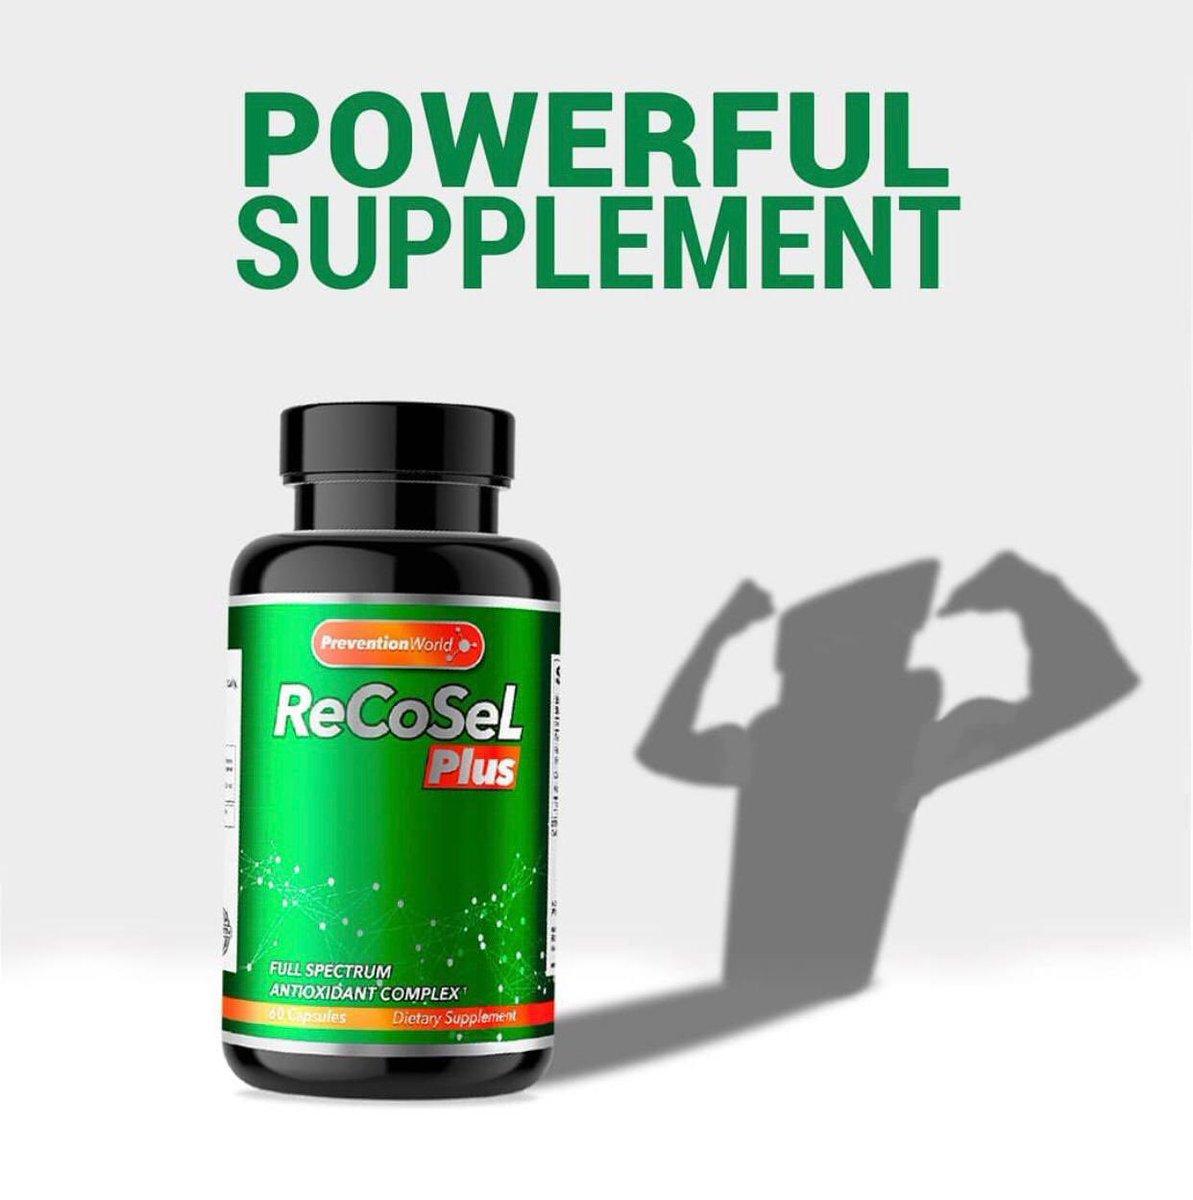 https://t.co/hVhAazIELk @recosel #antioxidants #Amazon #PreventionIsBetterThanCure #prevention #healthyliving #healthylifestyle #antioxidantsupport #antioxidantesnaturales https://t.co/mMaXZ9ffse